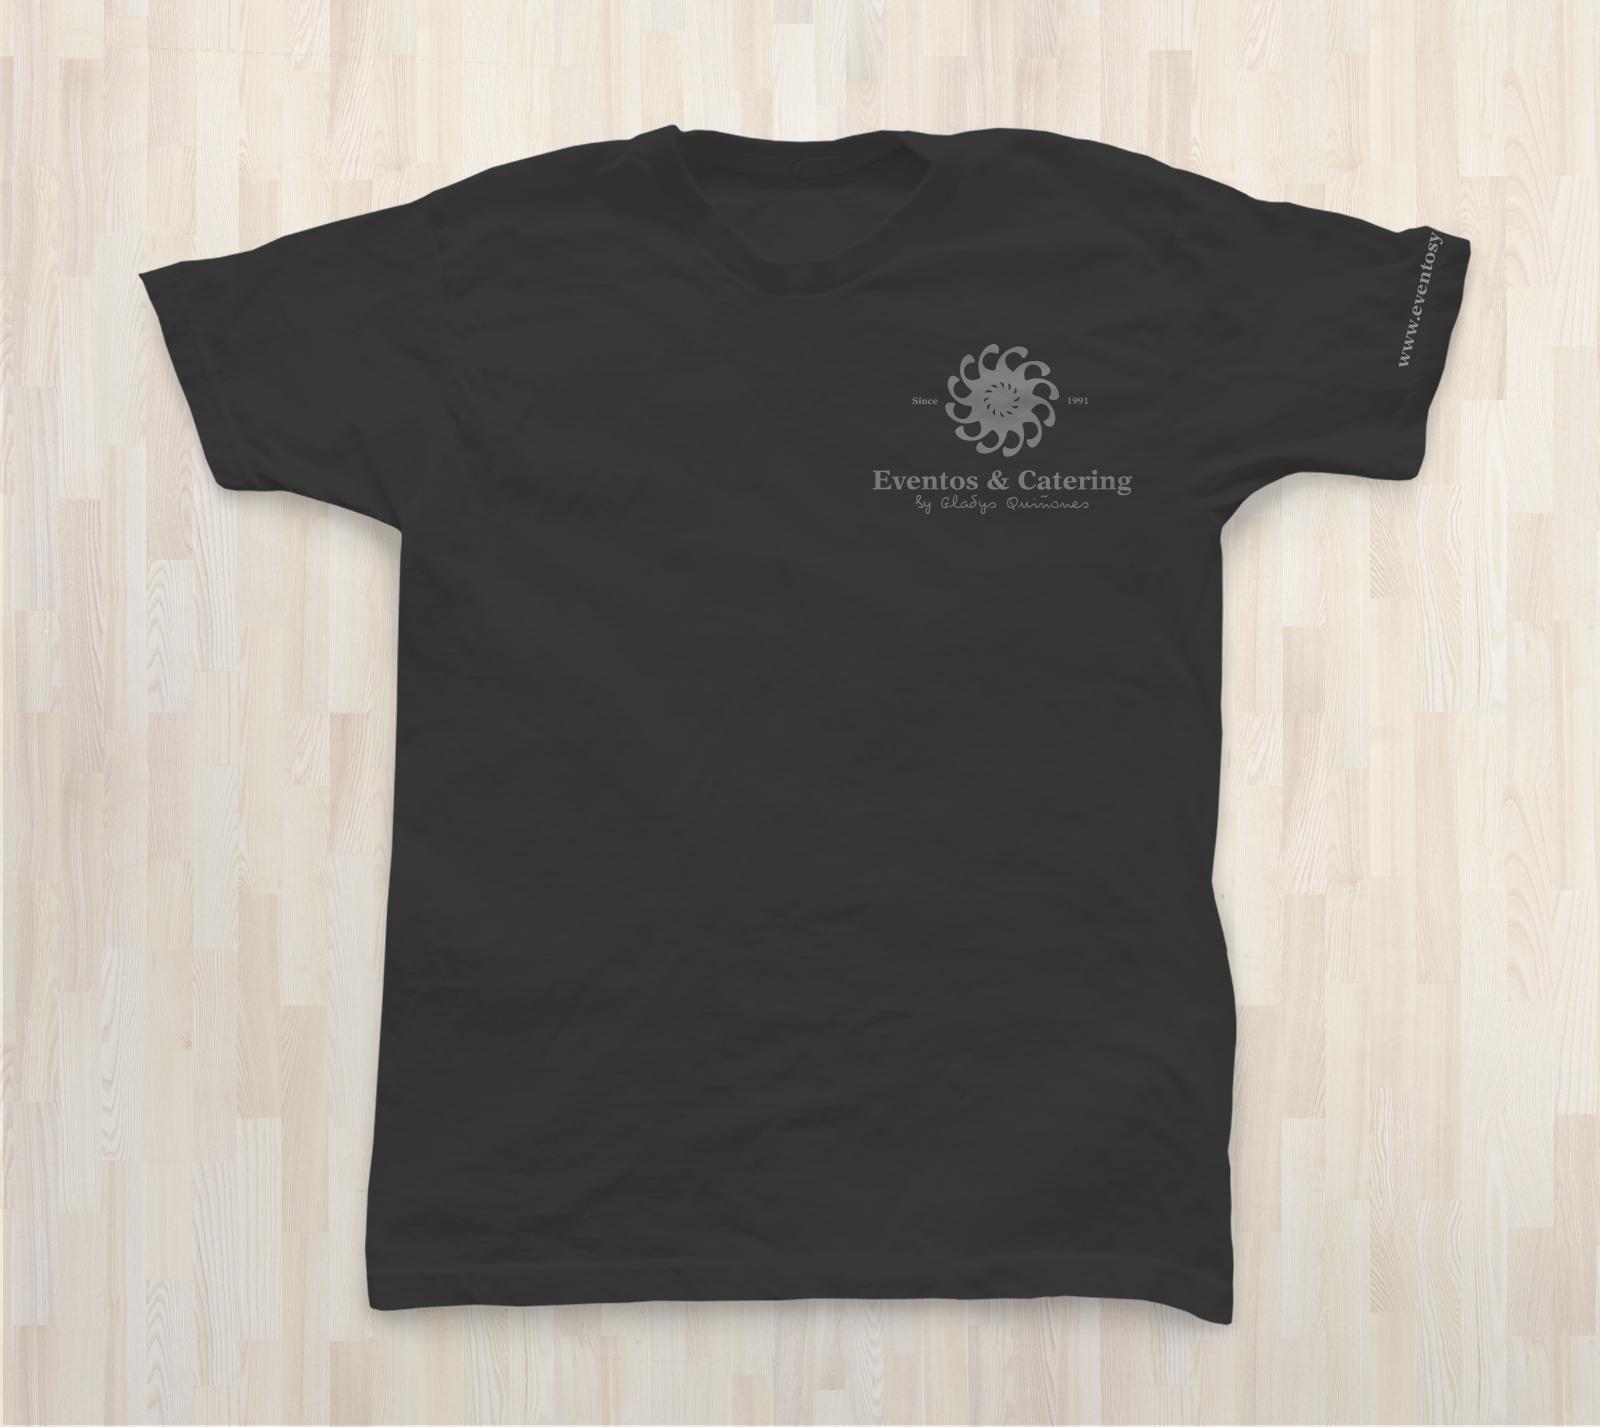 preview-parte-delantera-camiseta-negra